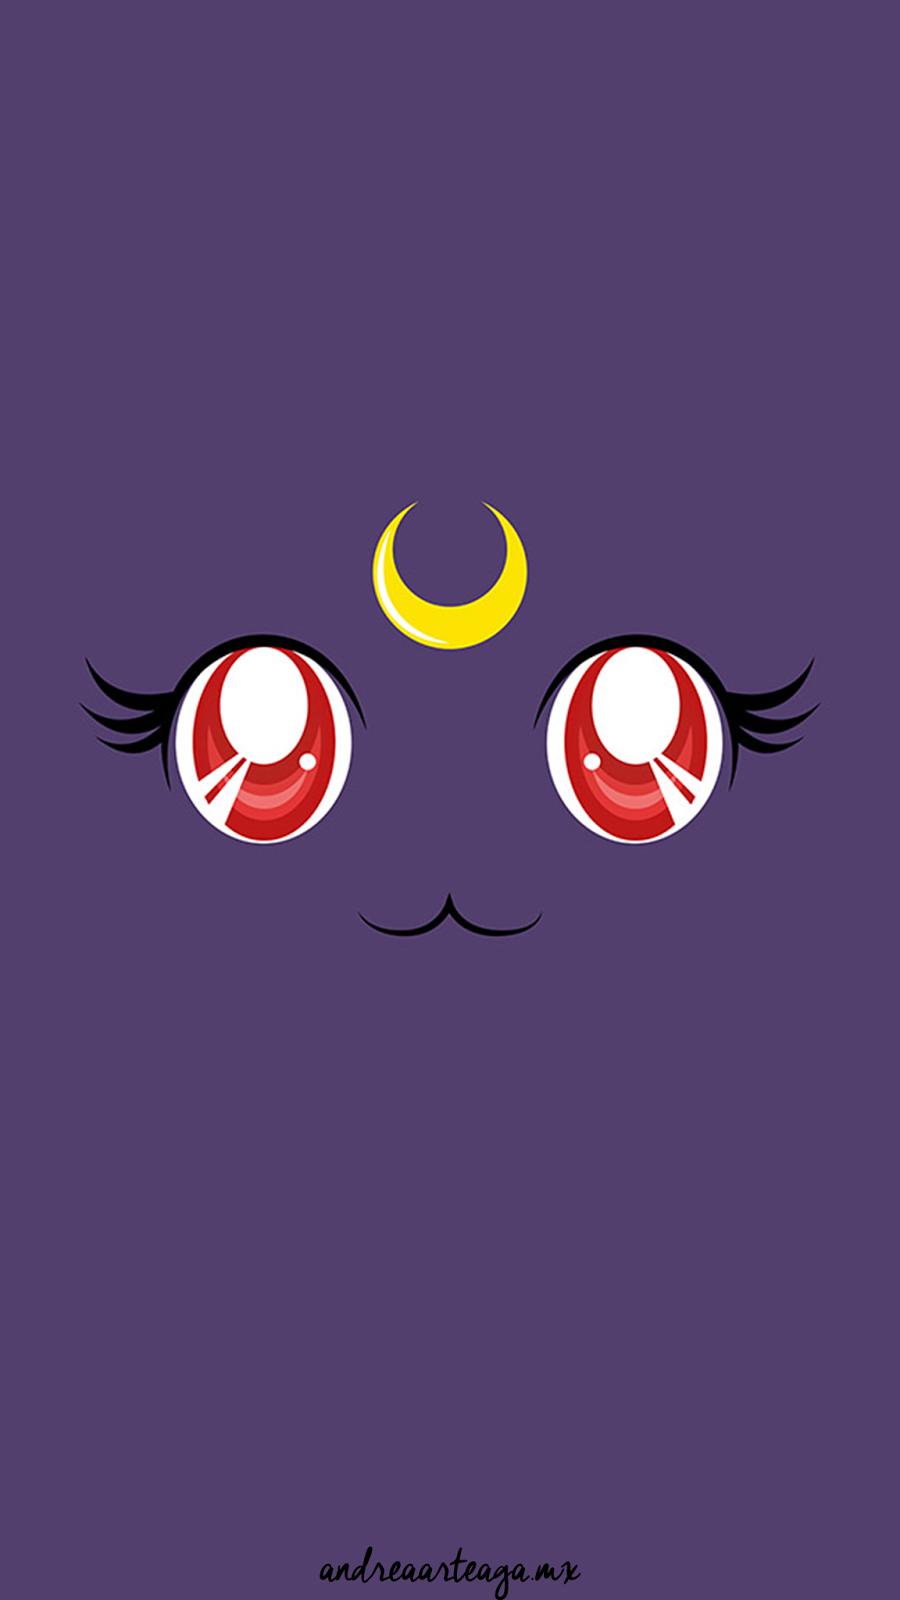 Andrea Arteaga ♡ Sailor Moon inspiration Wallpaper